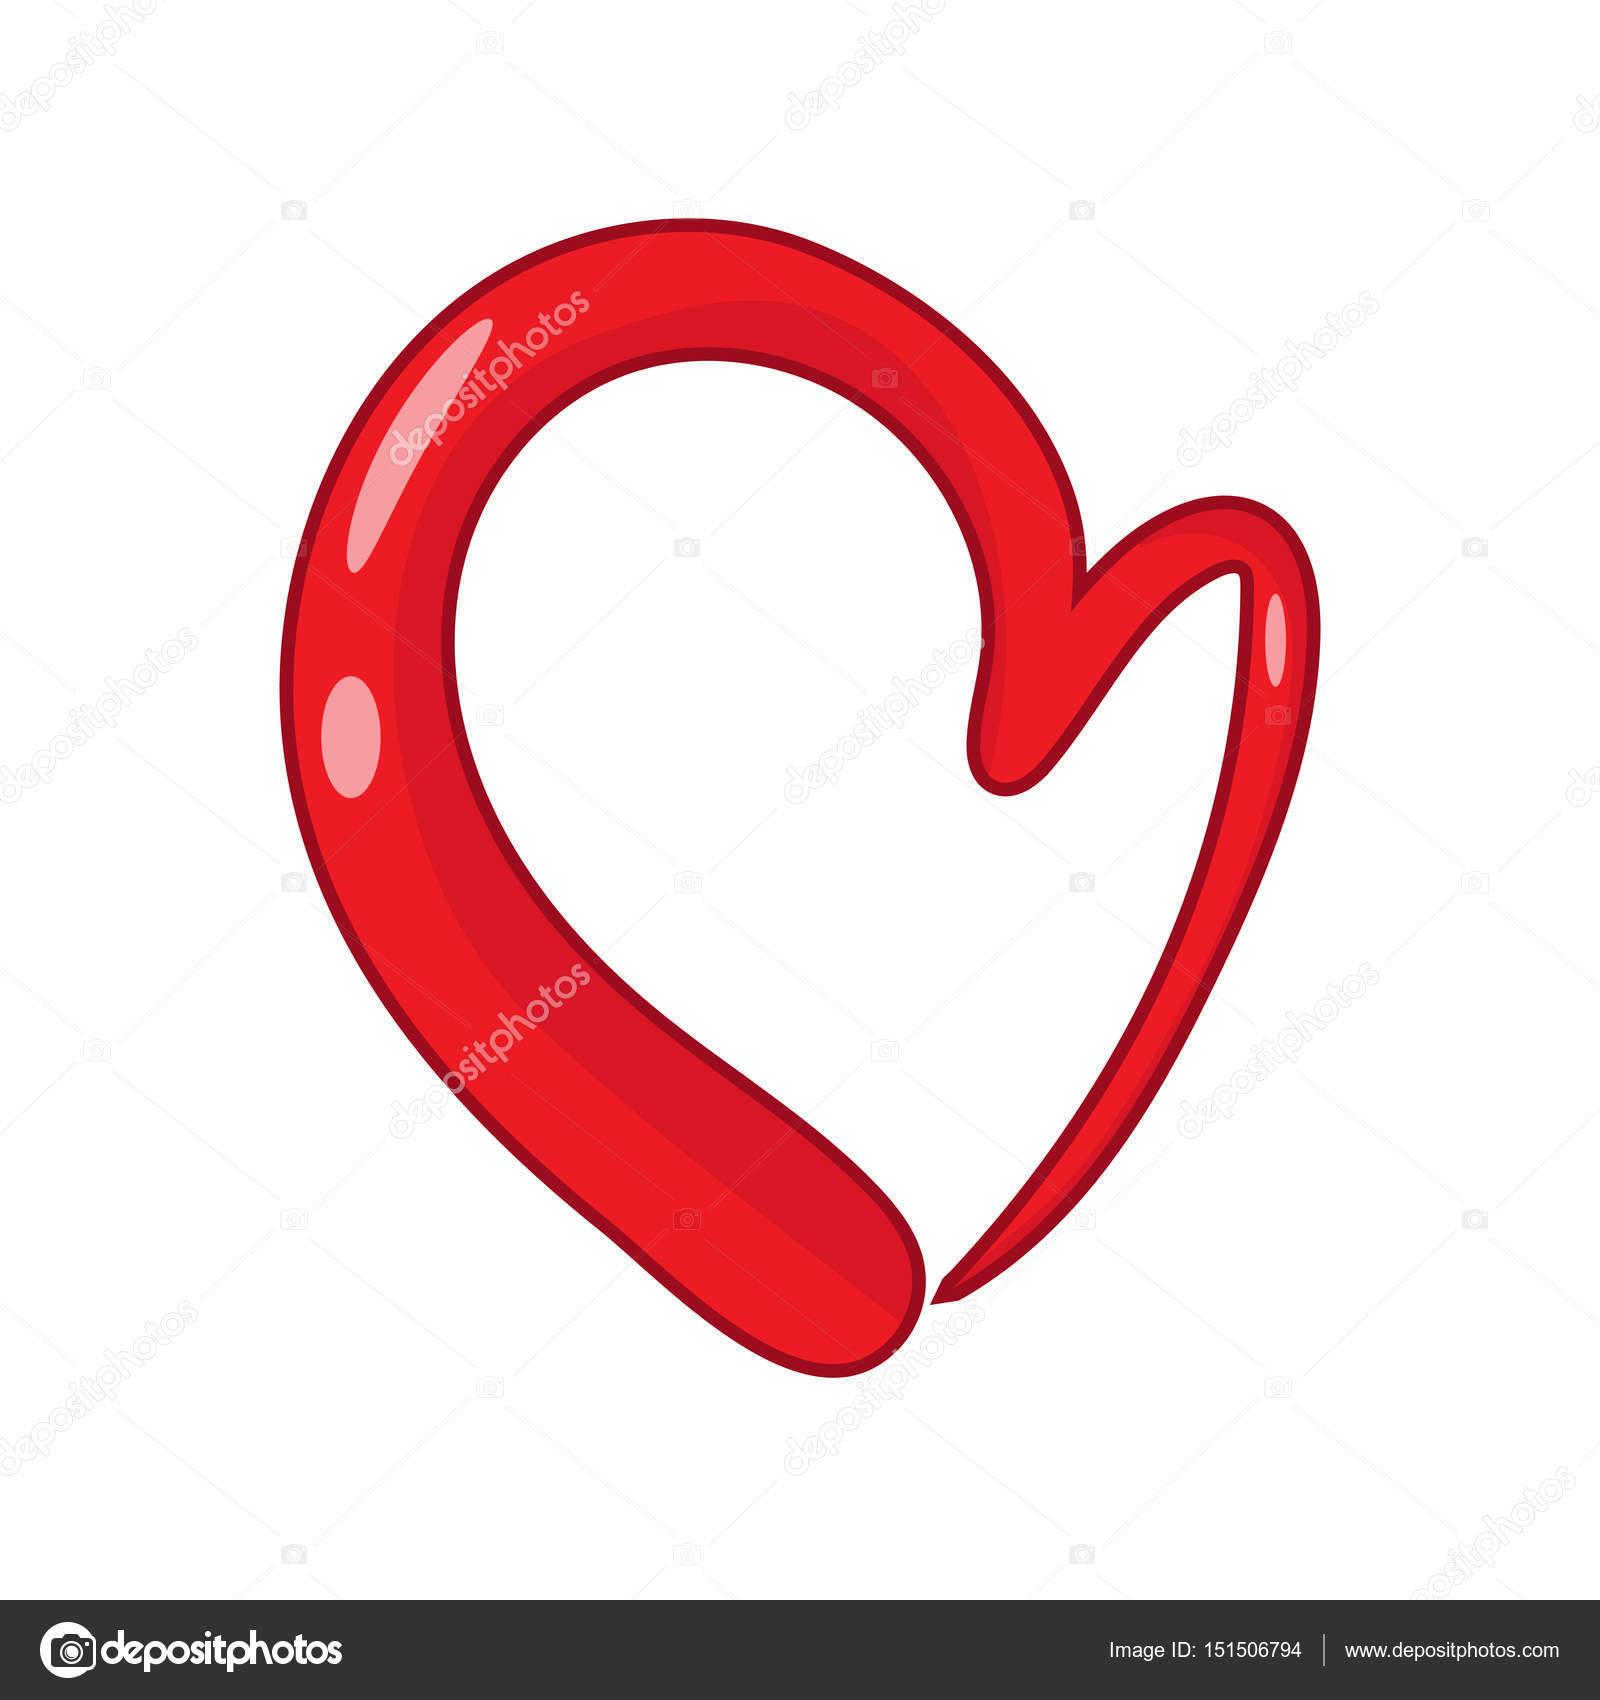 Heart shape design for love symbols valentines day stock heart shape design for love symbols valentines day stock vector 151506794 biocorpaavc